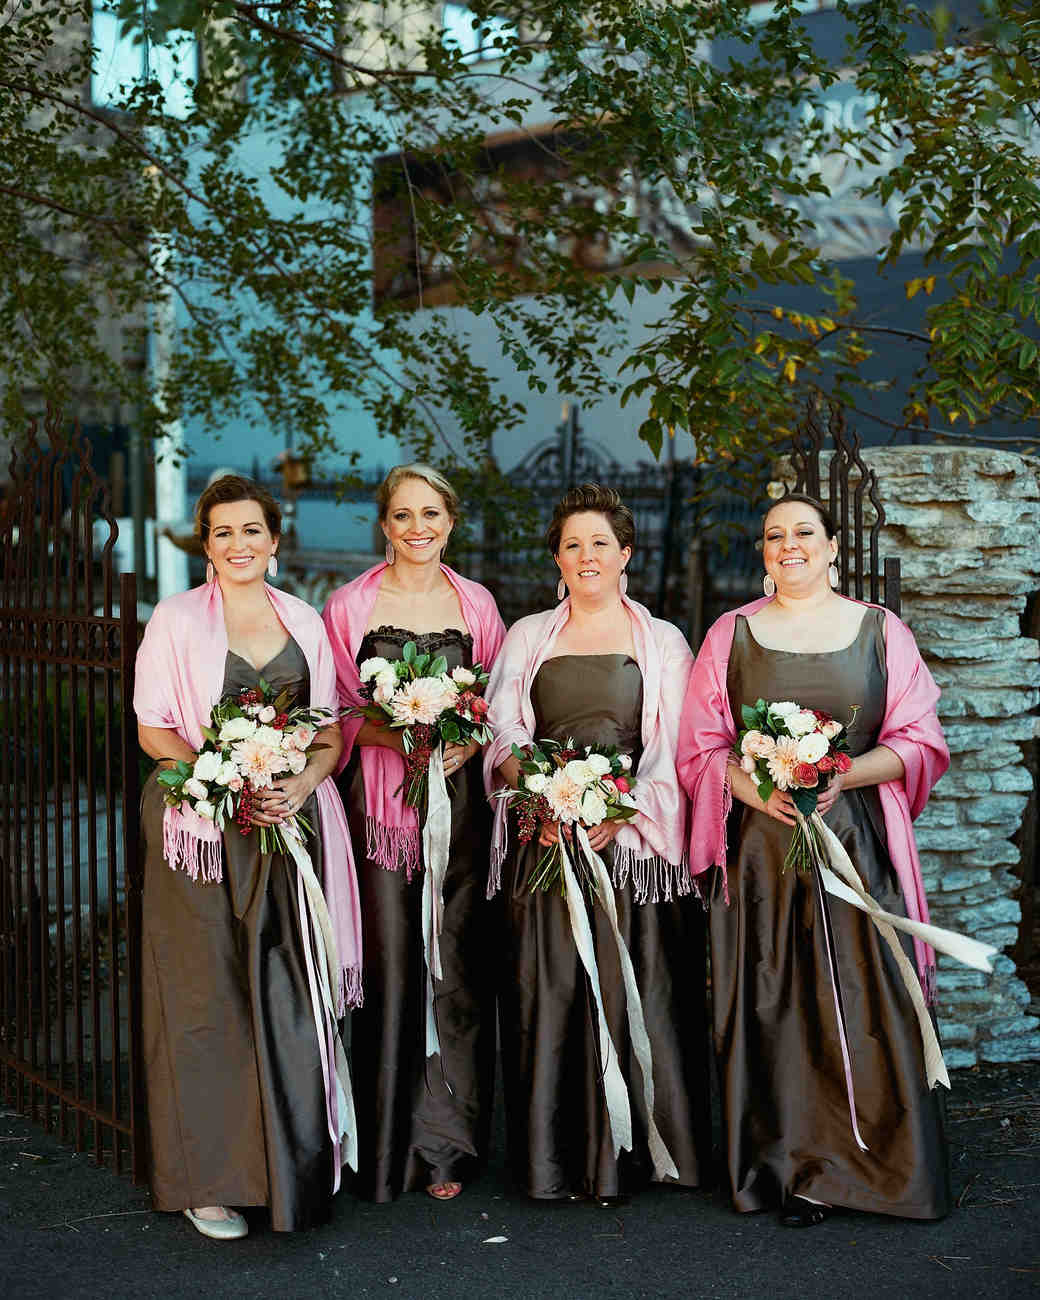 maddy-mike-wedding-bridesmaids-257.9727.03.2015.49-6134174-0716.jpg